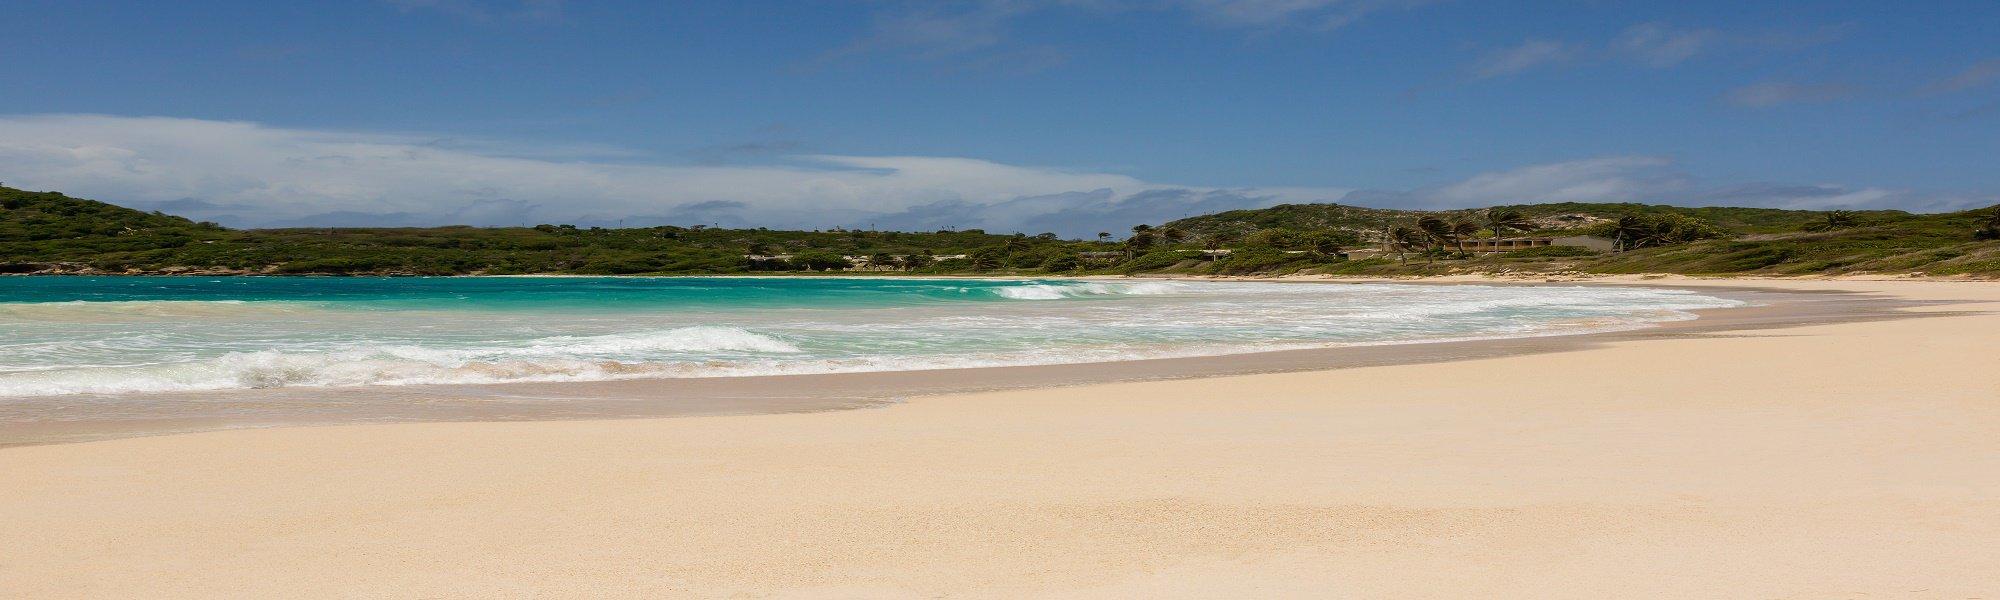 Rex Halcyon Cove image